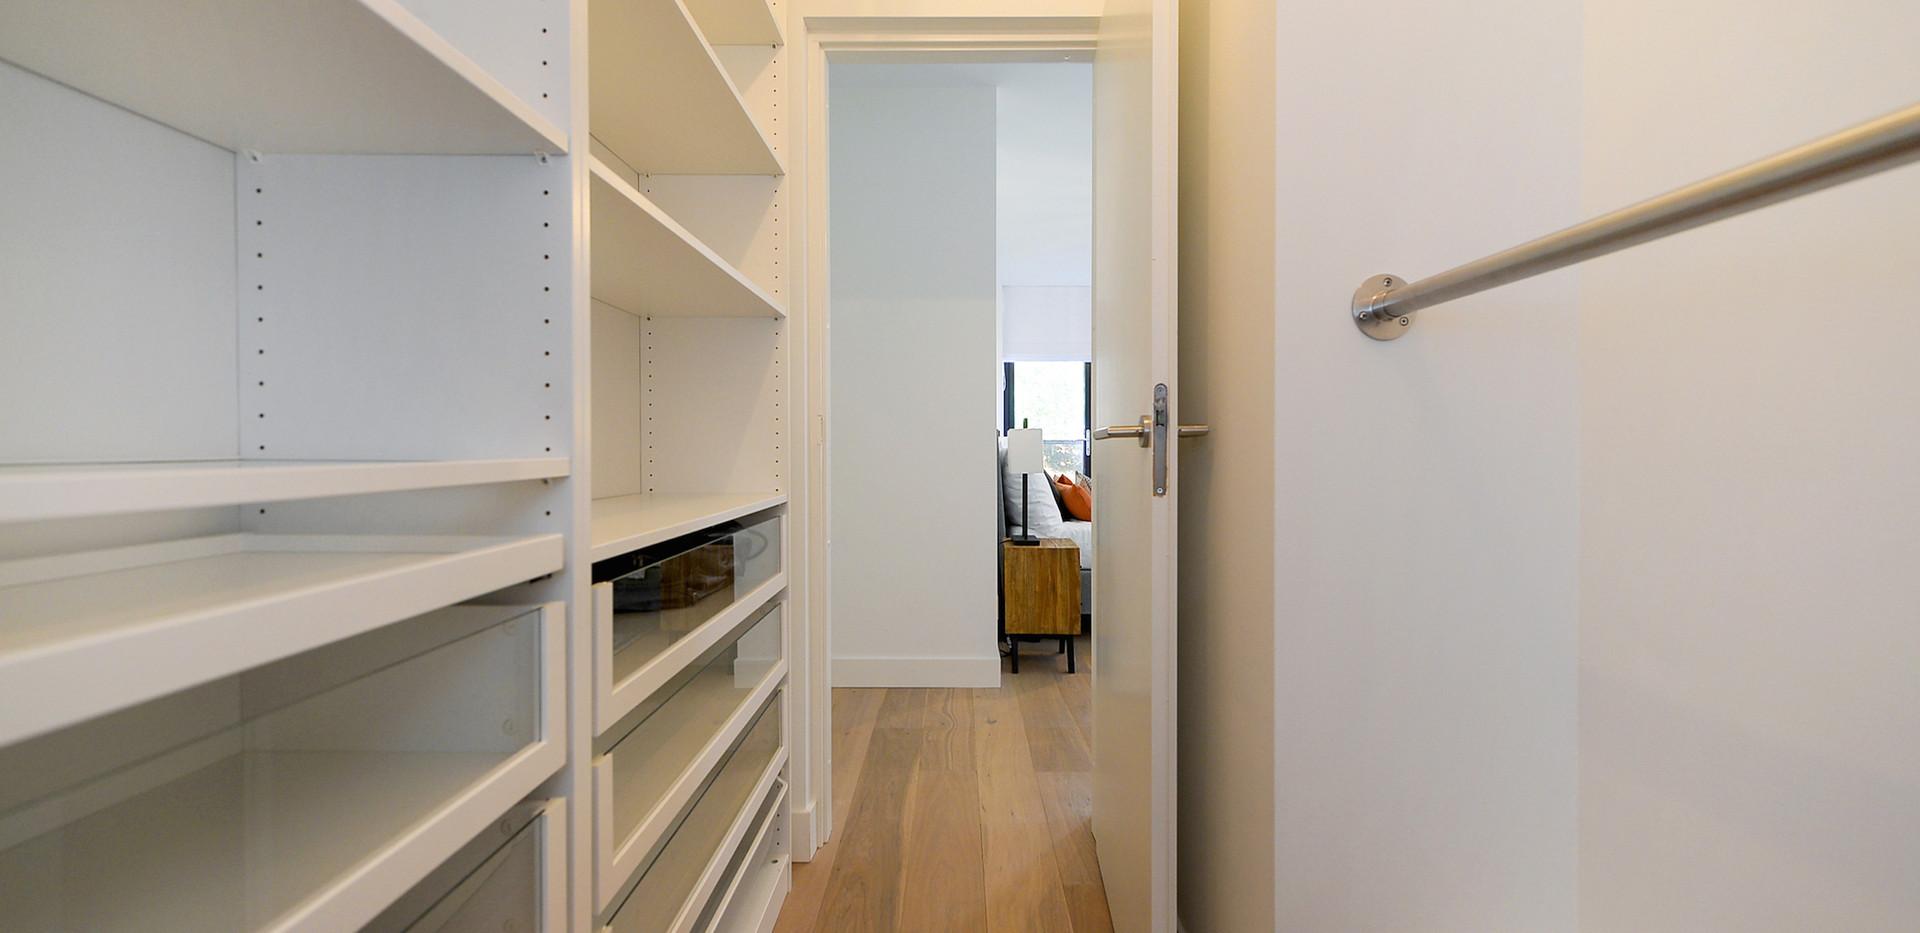 Walk-in closet next to master bedroom